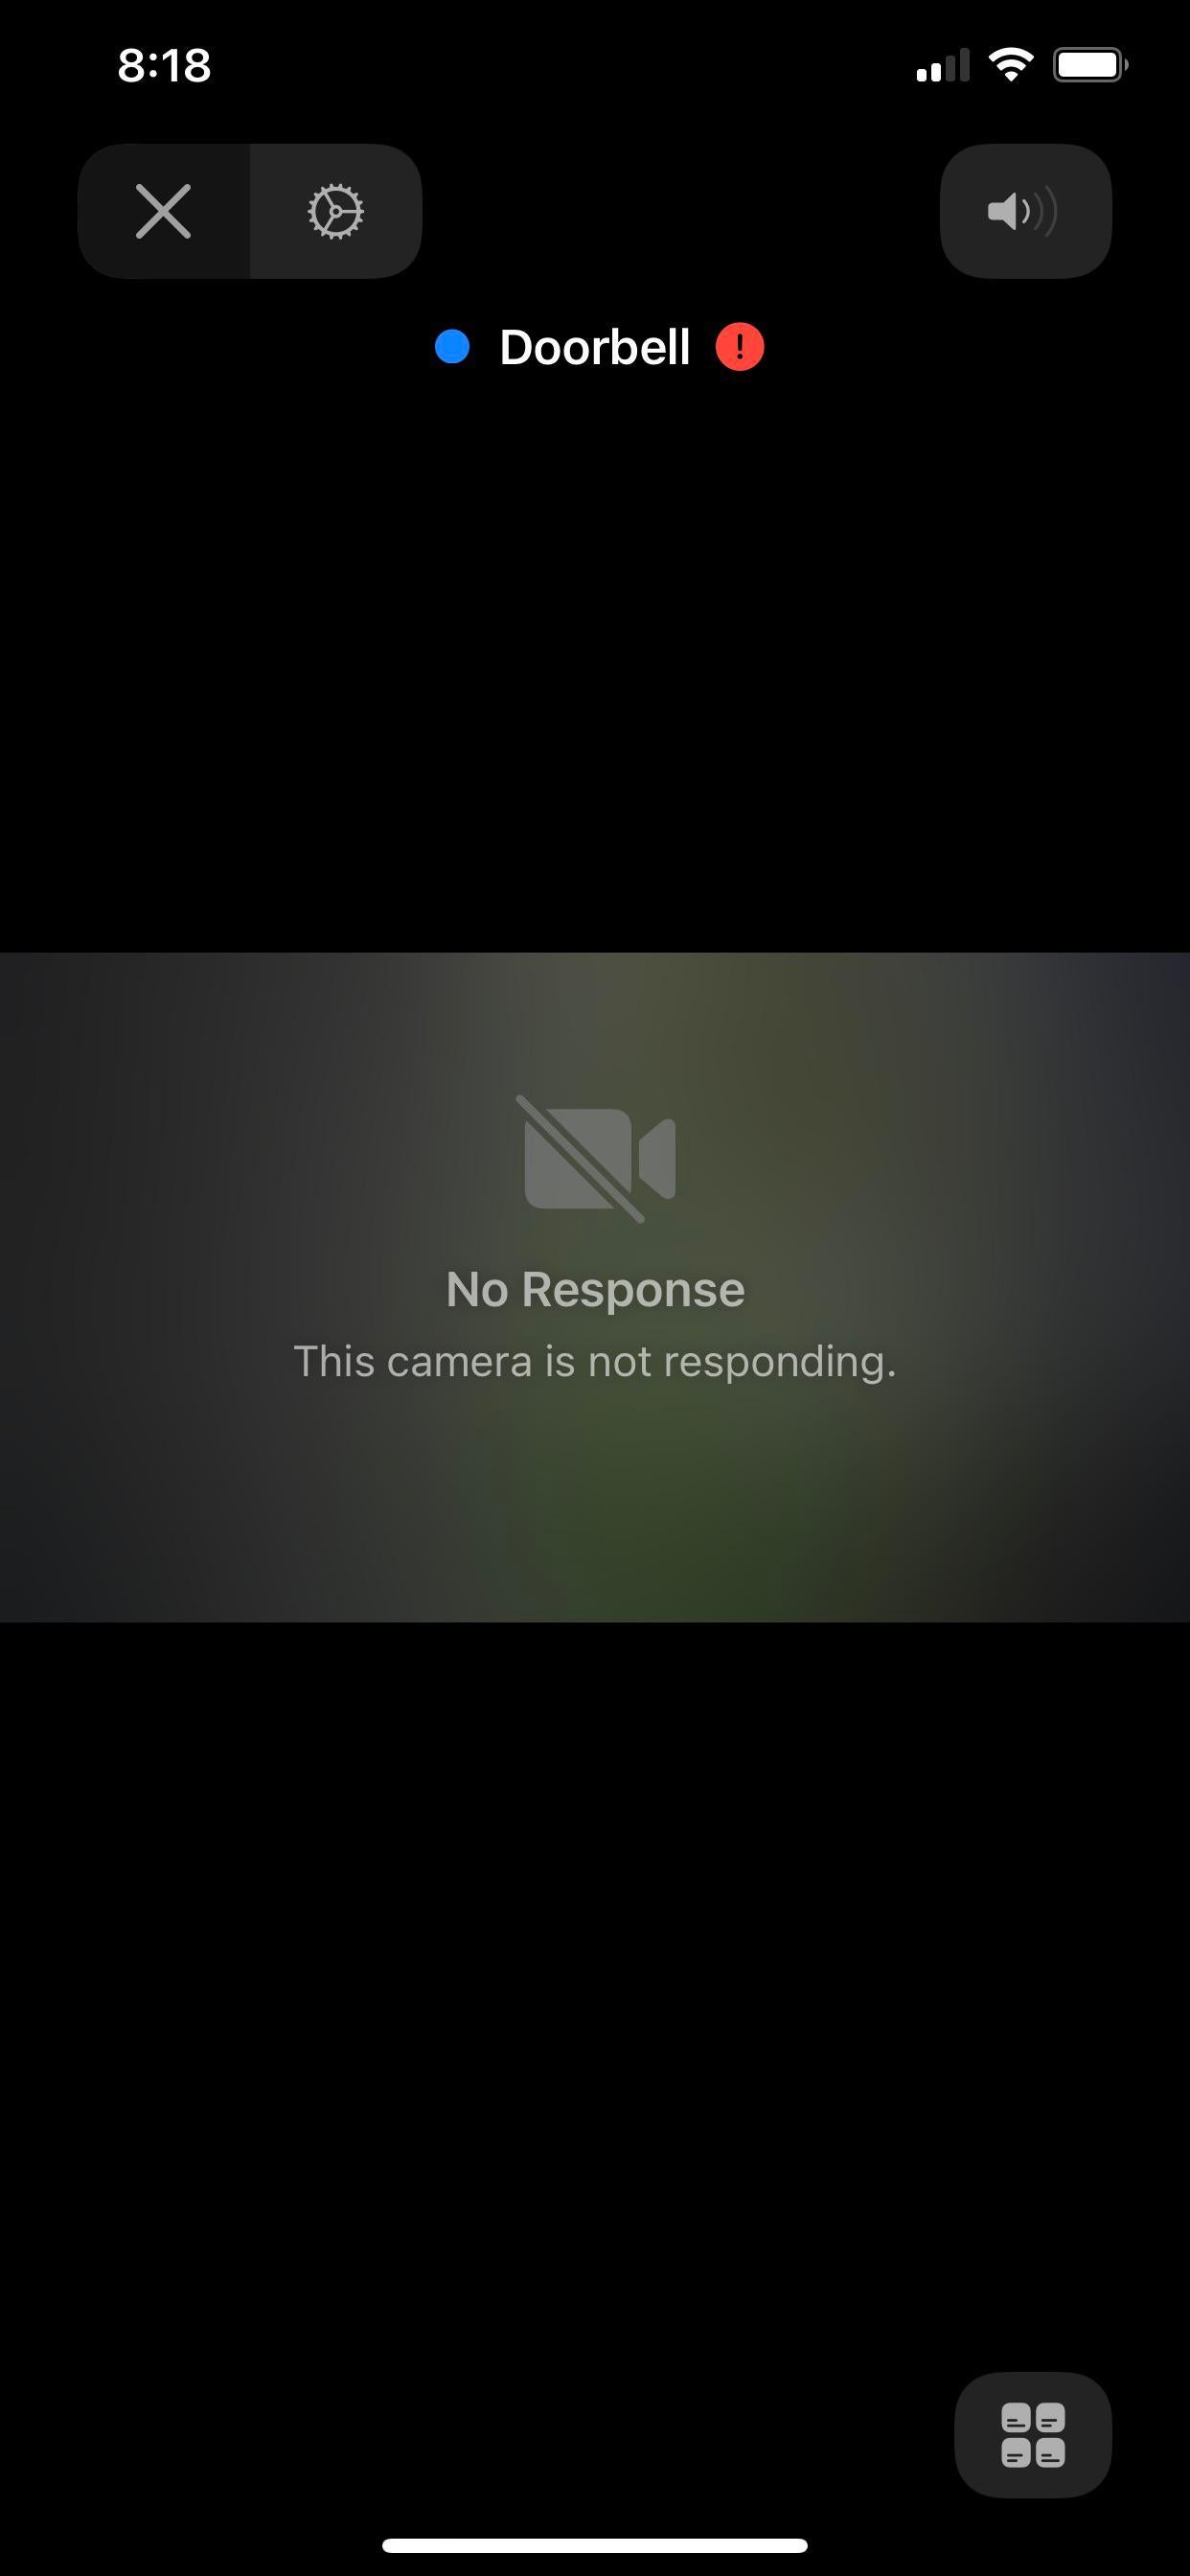 My experience with Homekit cameras so far